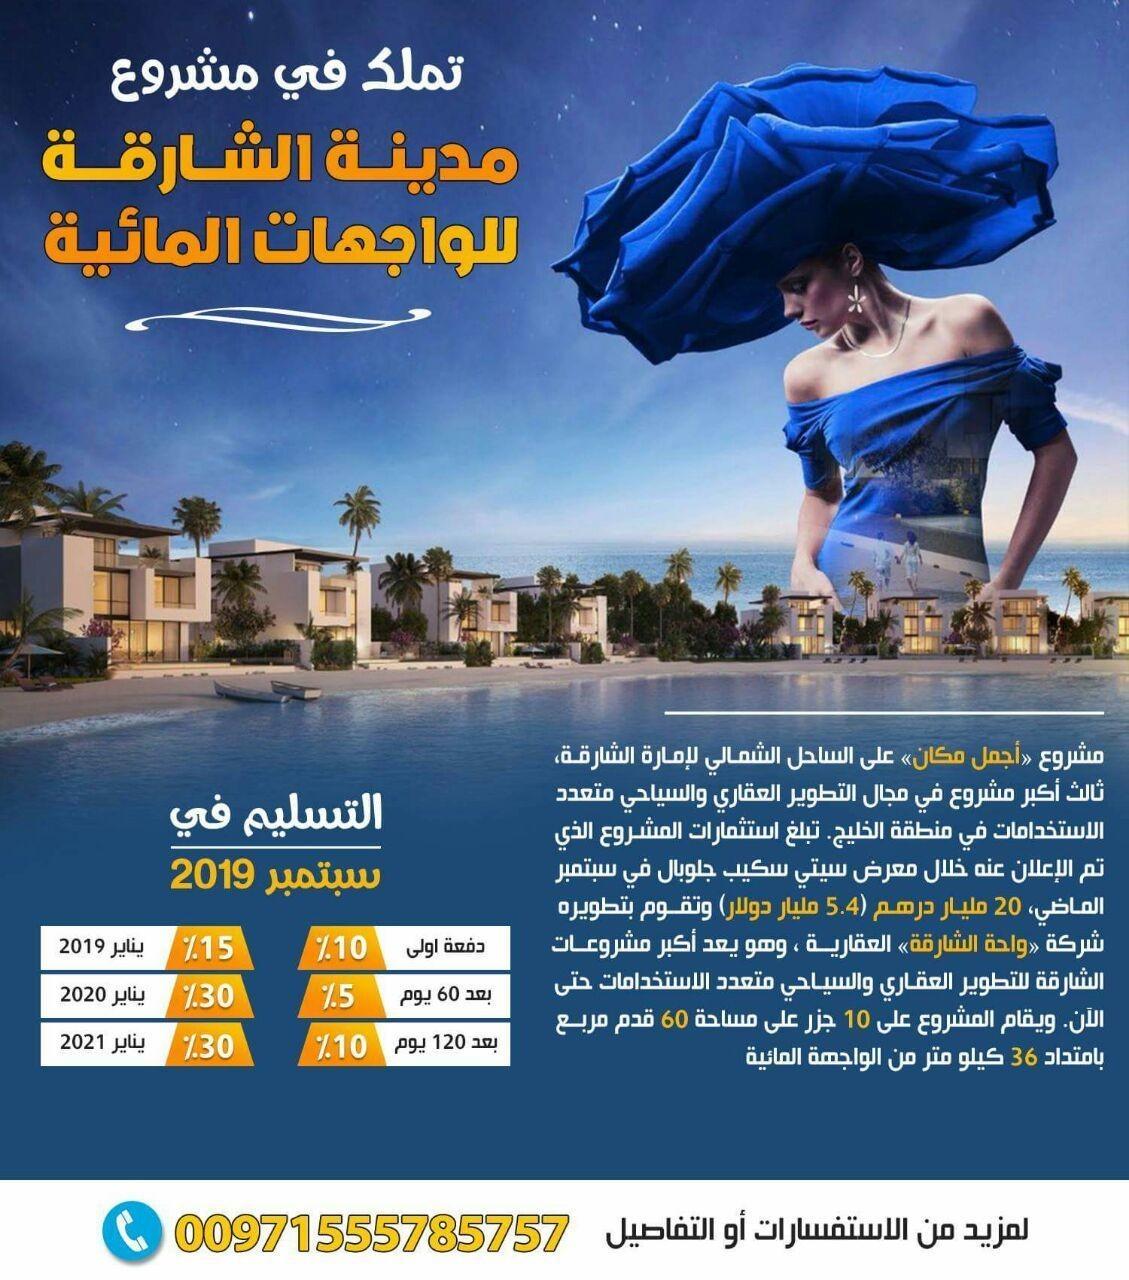 Sharjah Waterfront AJMAL MAKAN